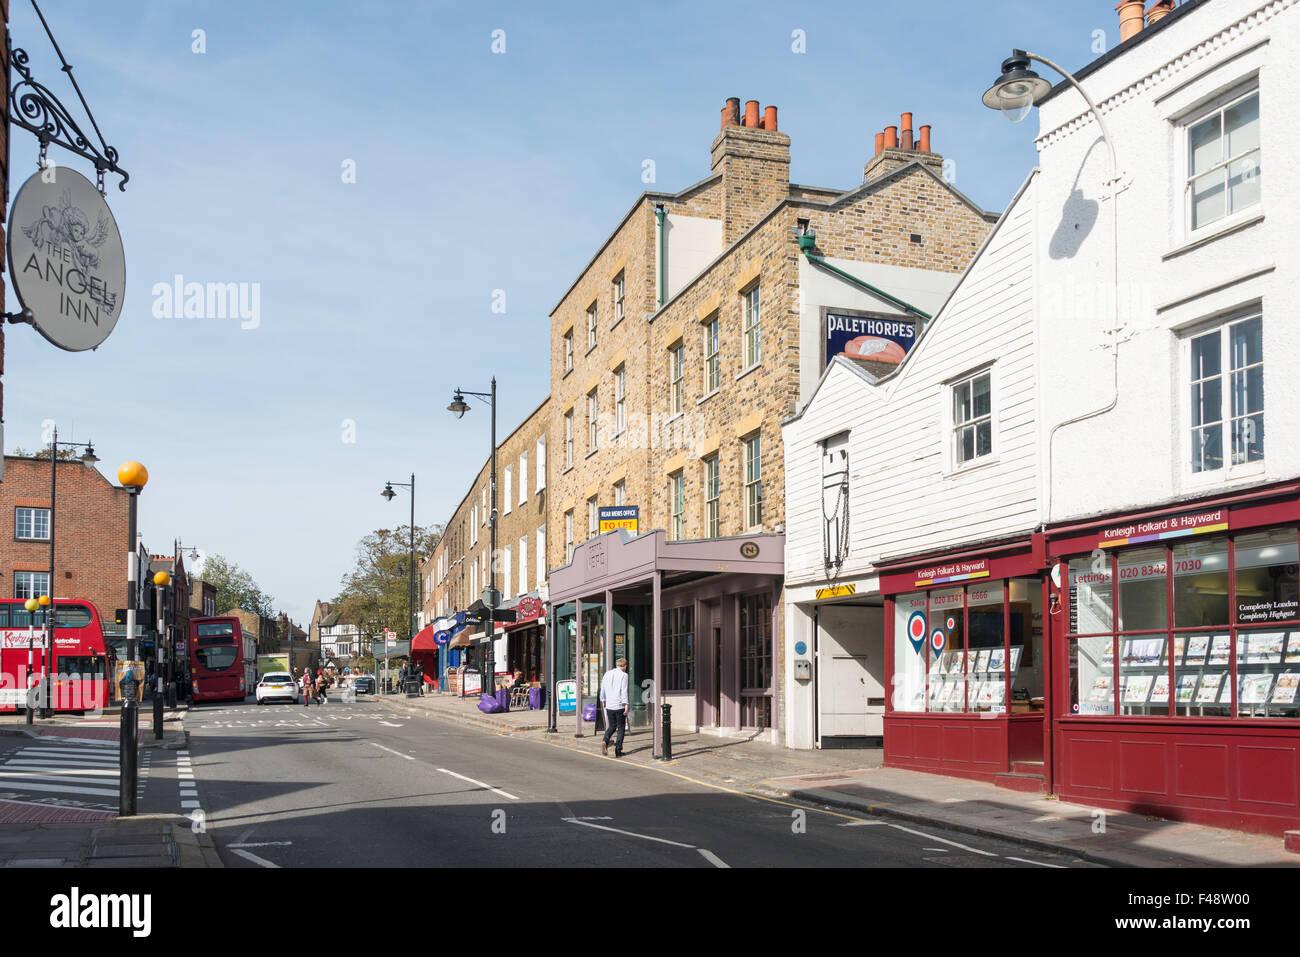 Highgate High Street, Highgate, London Borough of Haringey, Greater London, England, United Kingdom - Stock Image